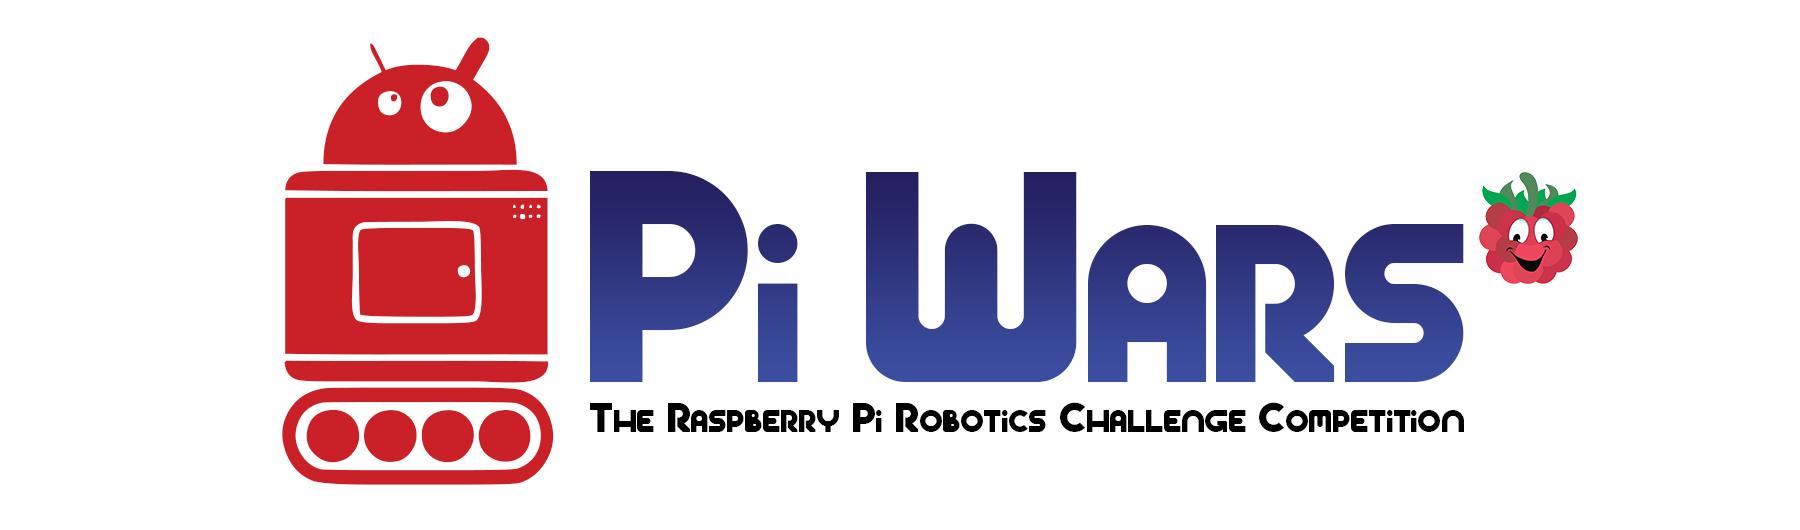 Pi Wars 2018 - Spectators